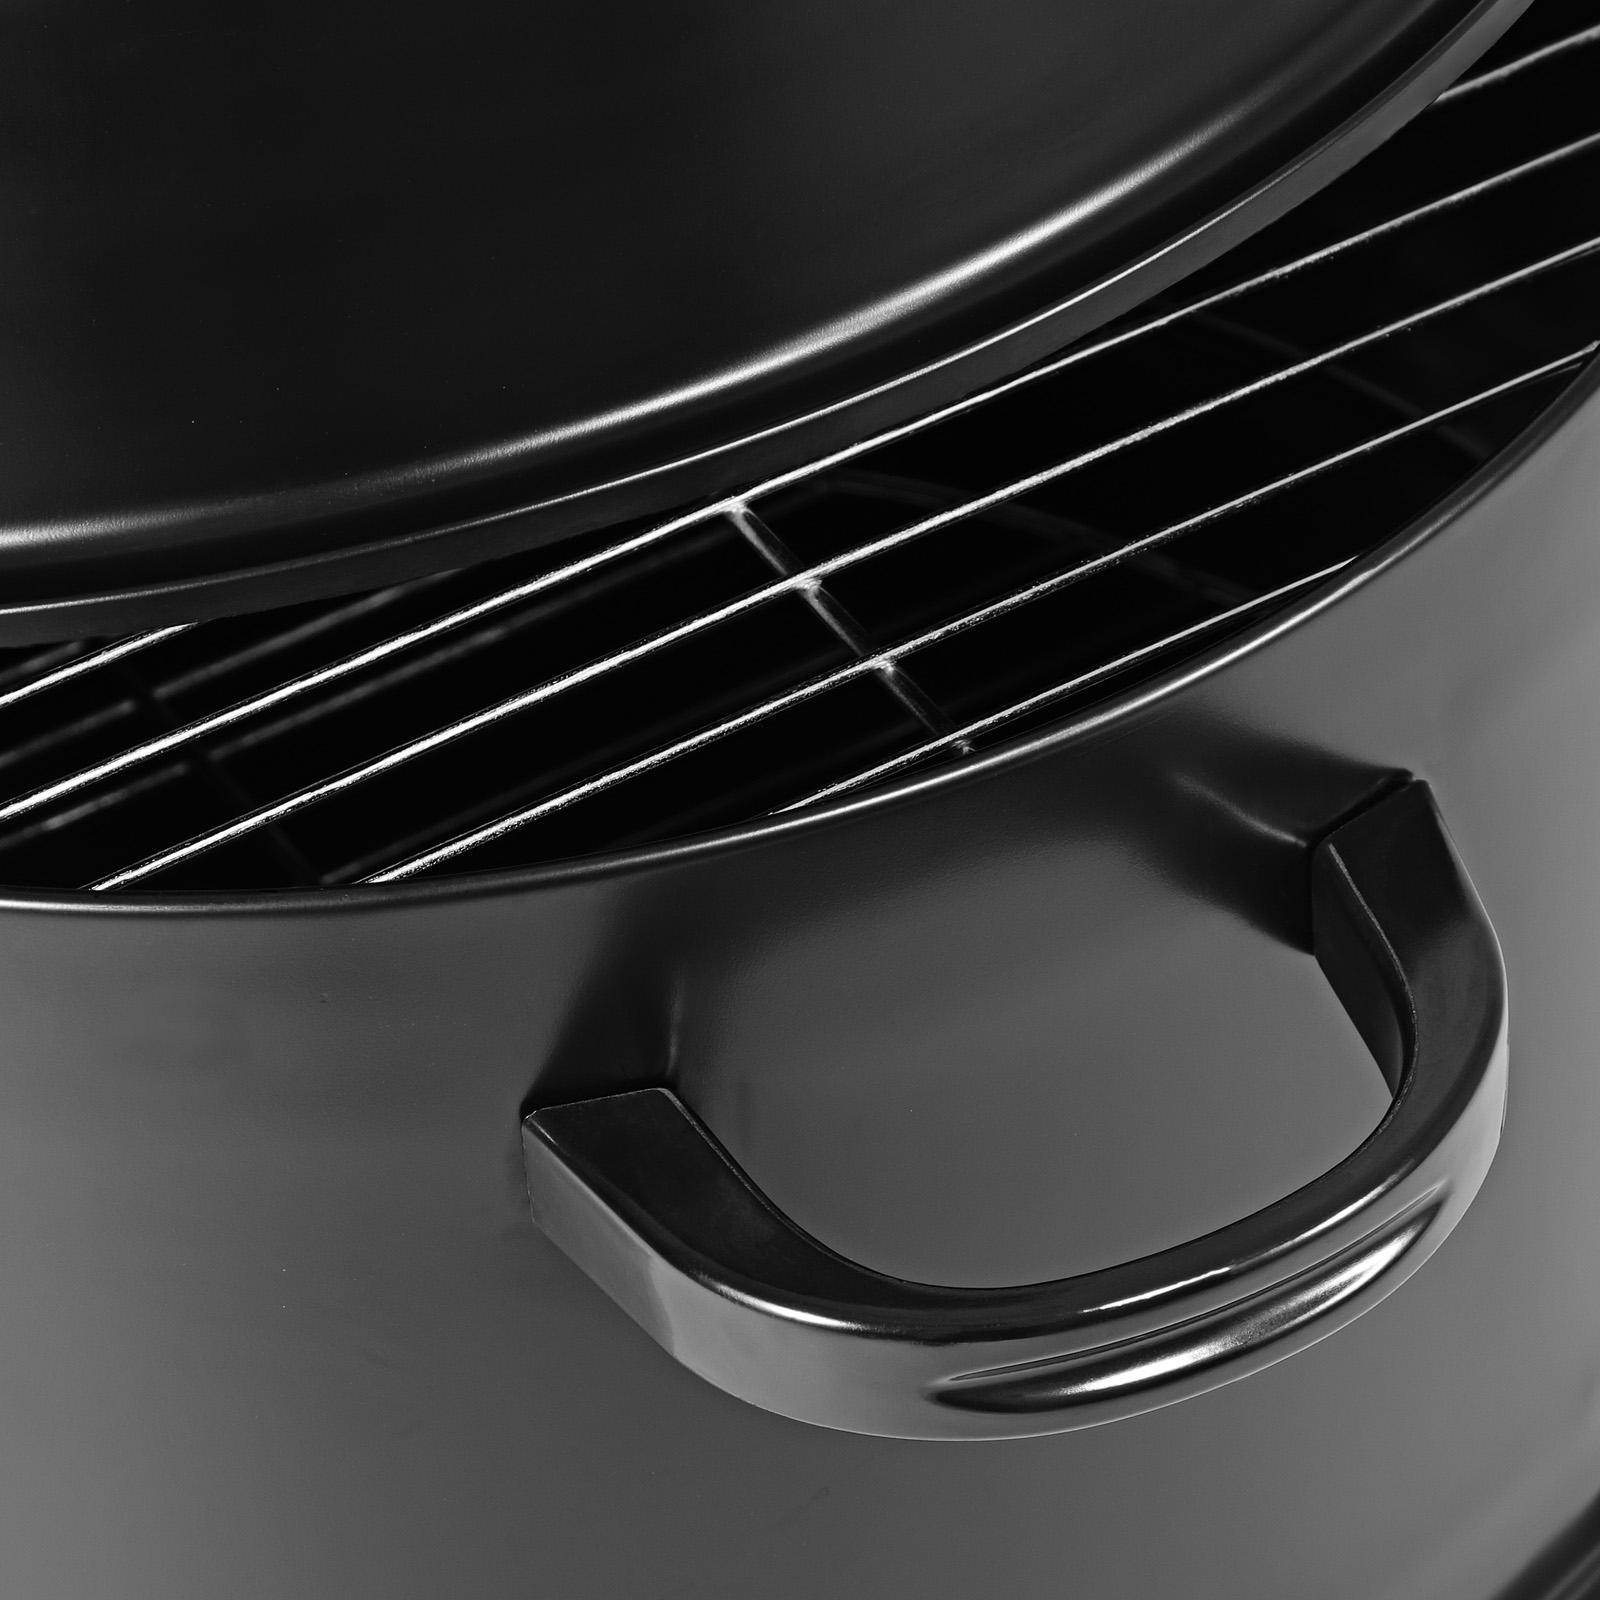 b ware bbq smoker grill r ucherofen grillofen grilltonne. Black Bedroom Furniture Sets. Home Design Ideas